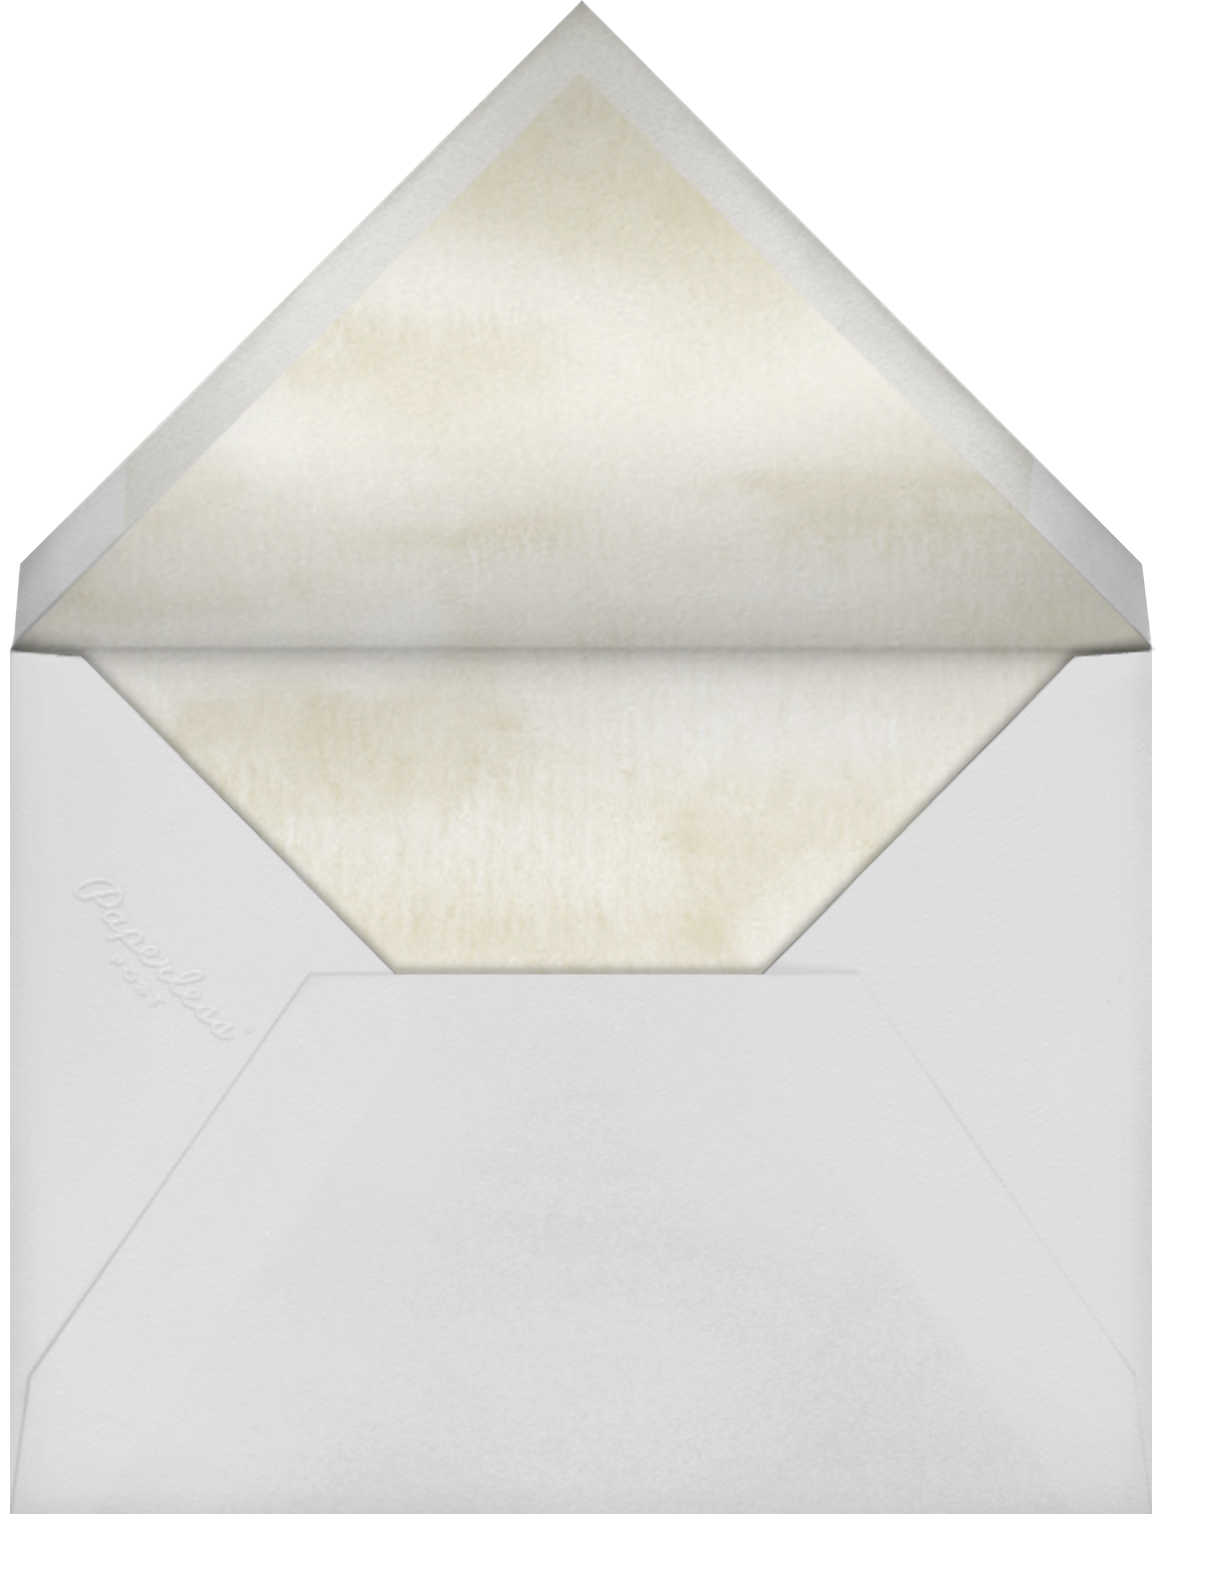 Naiad (Horizontal) - Felix Doolittle - Save the date - envelope back